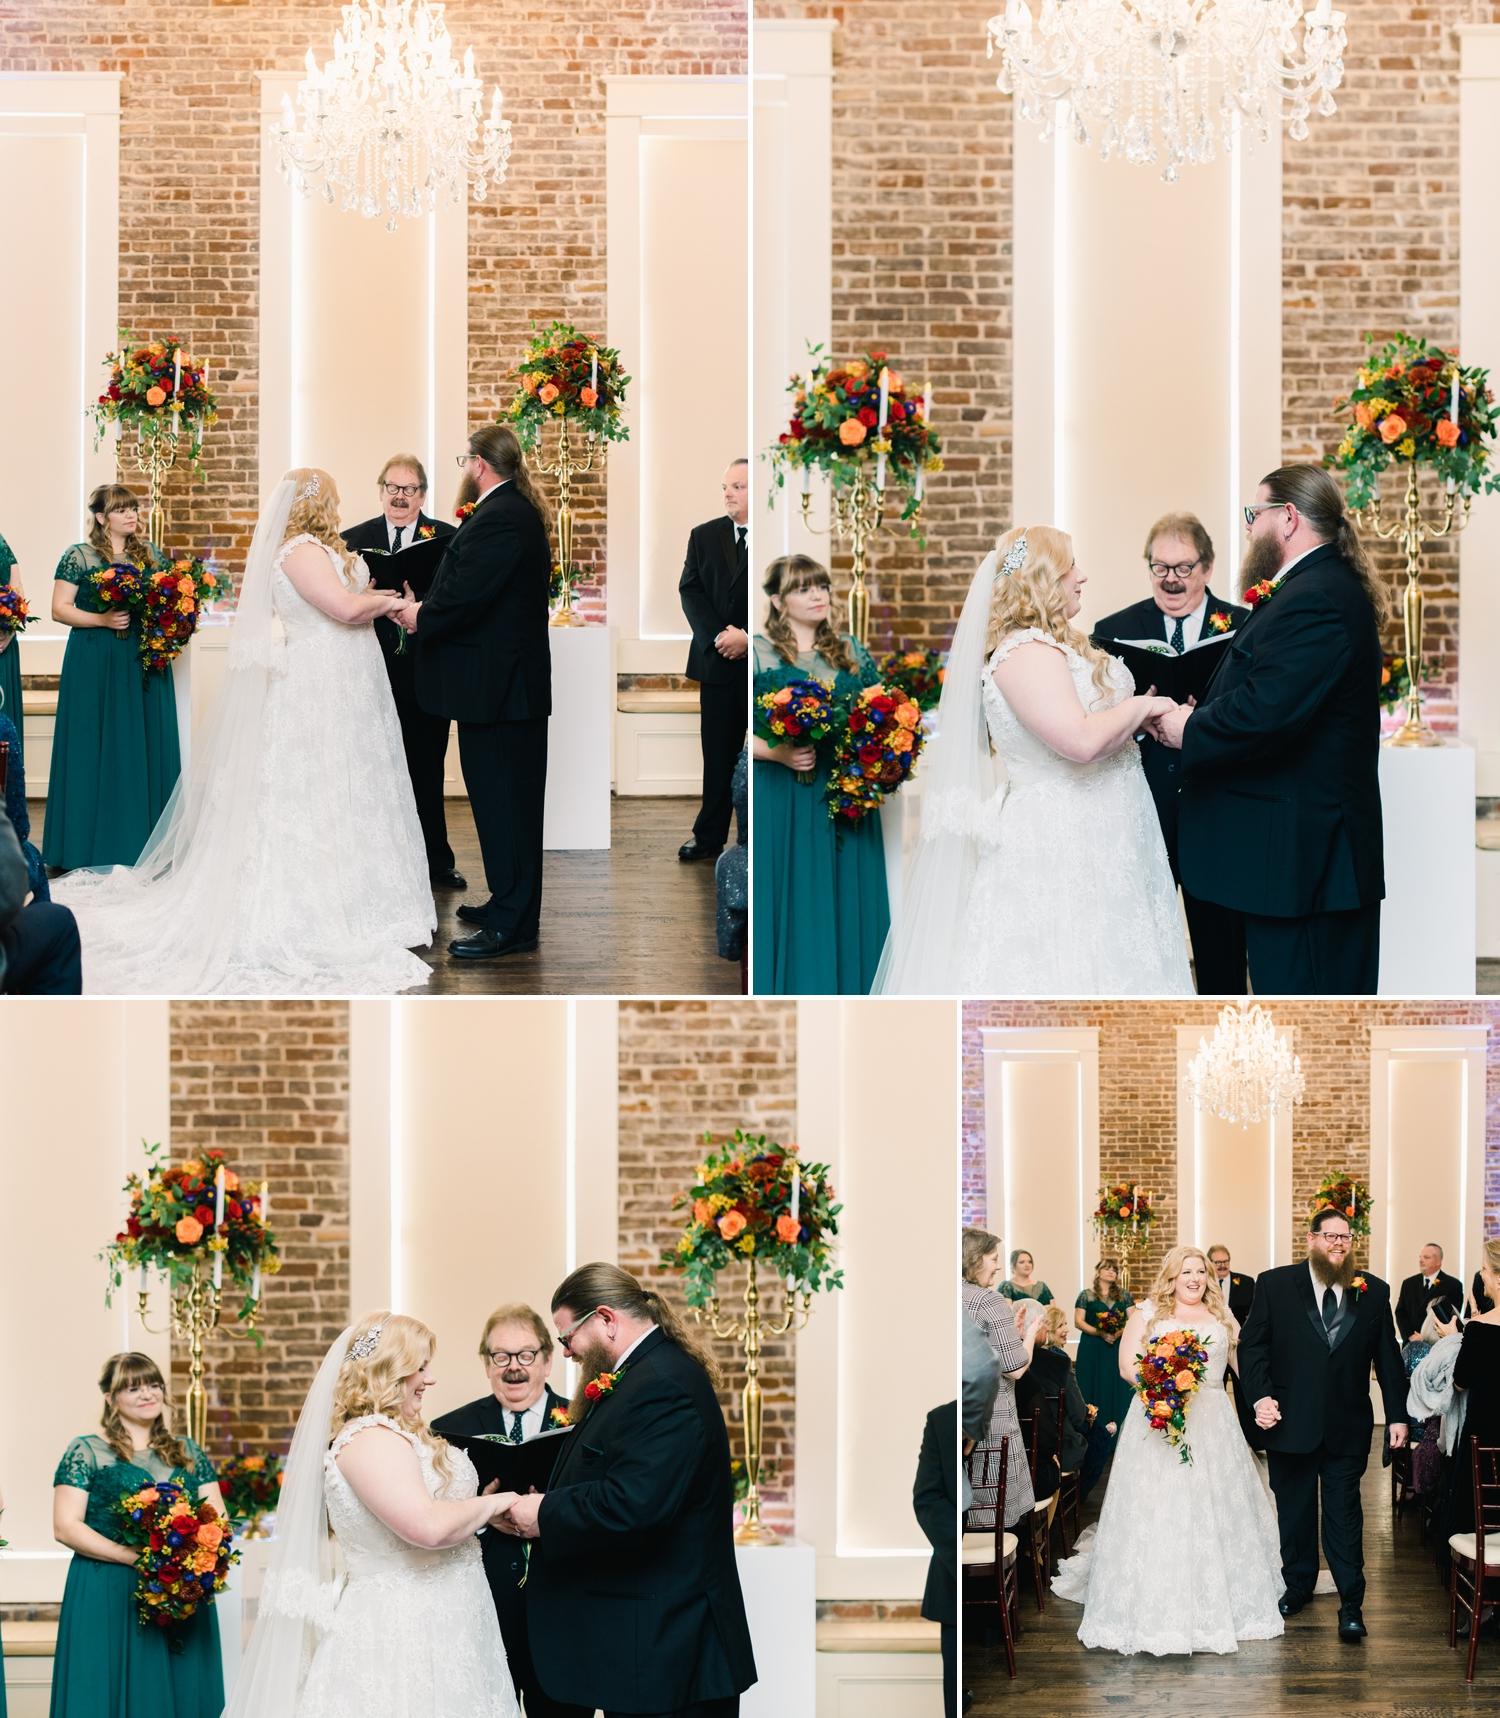 Ashley Ryan Wedding At The Grand Hotel Ballroom In Mckinney Tx Anna Smith Photography